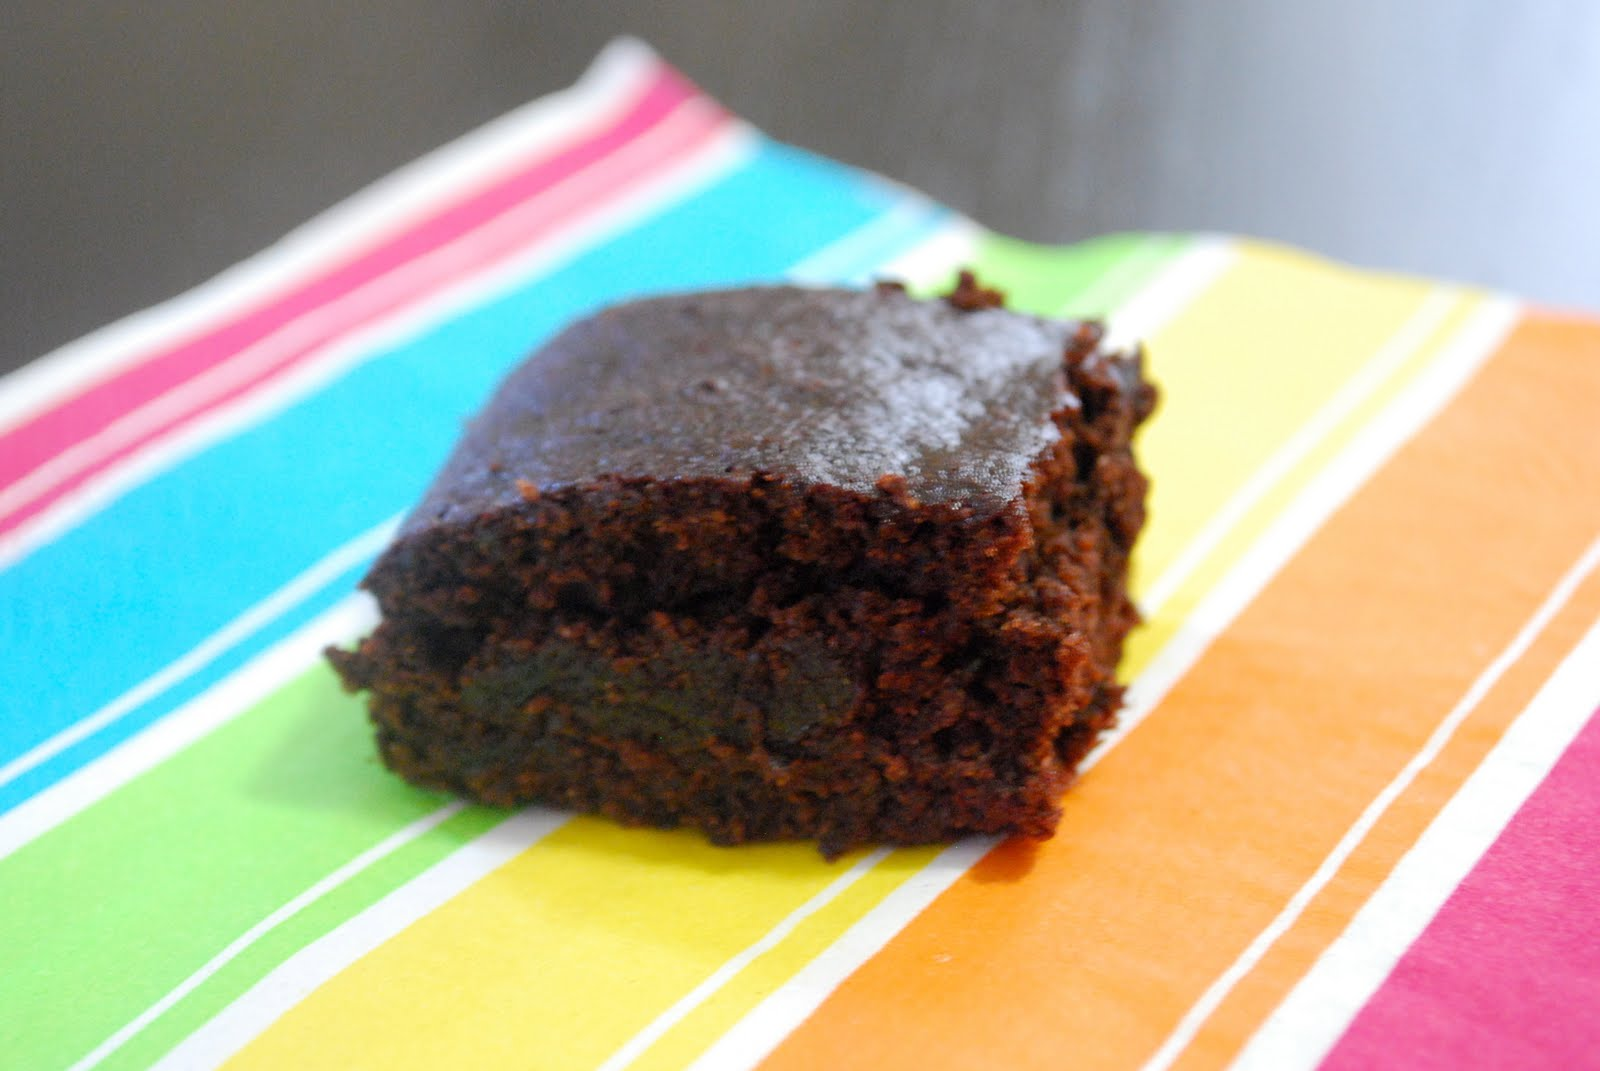 Krista's Allergy-Free Kitchen: Allergy Free Brownies (Gluten Free and ...